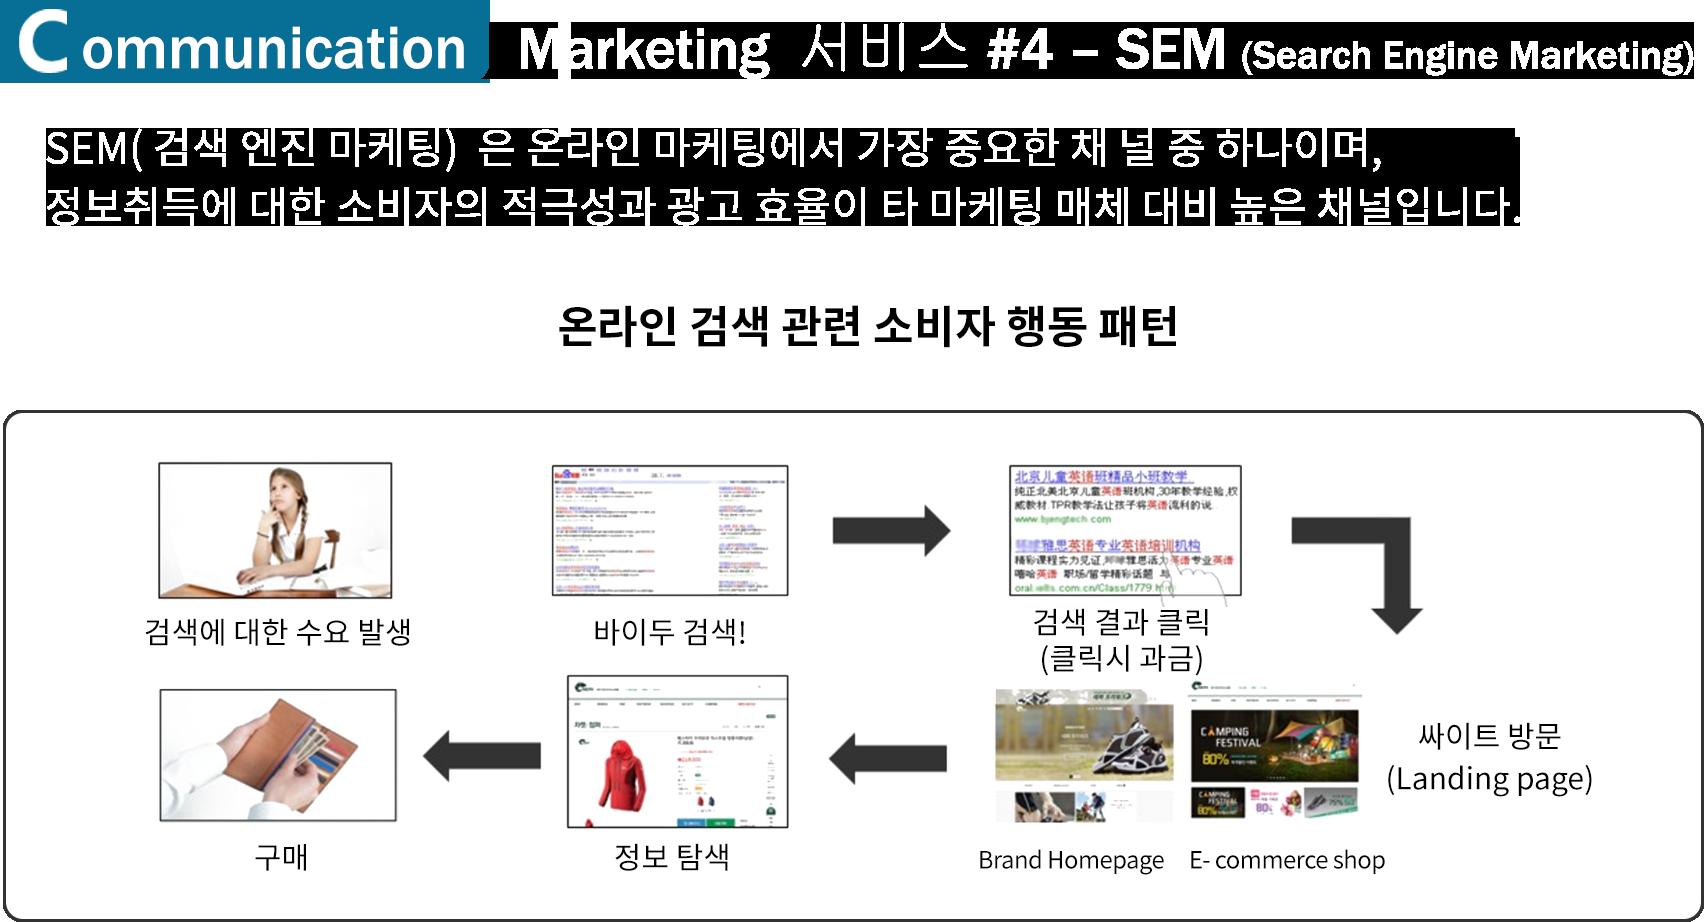 Communication-4韩文